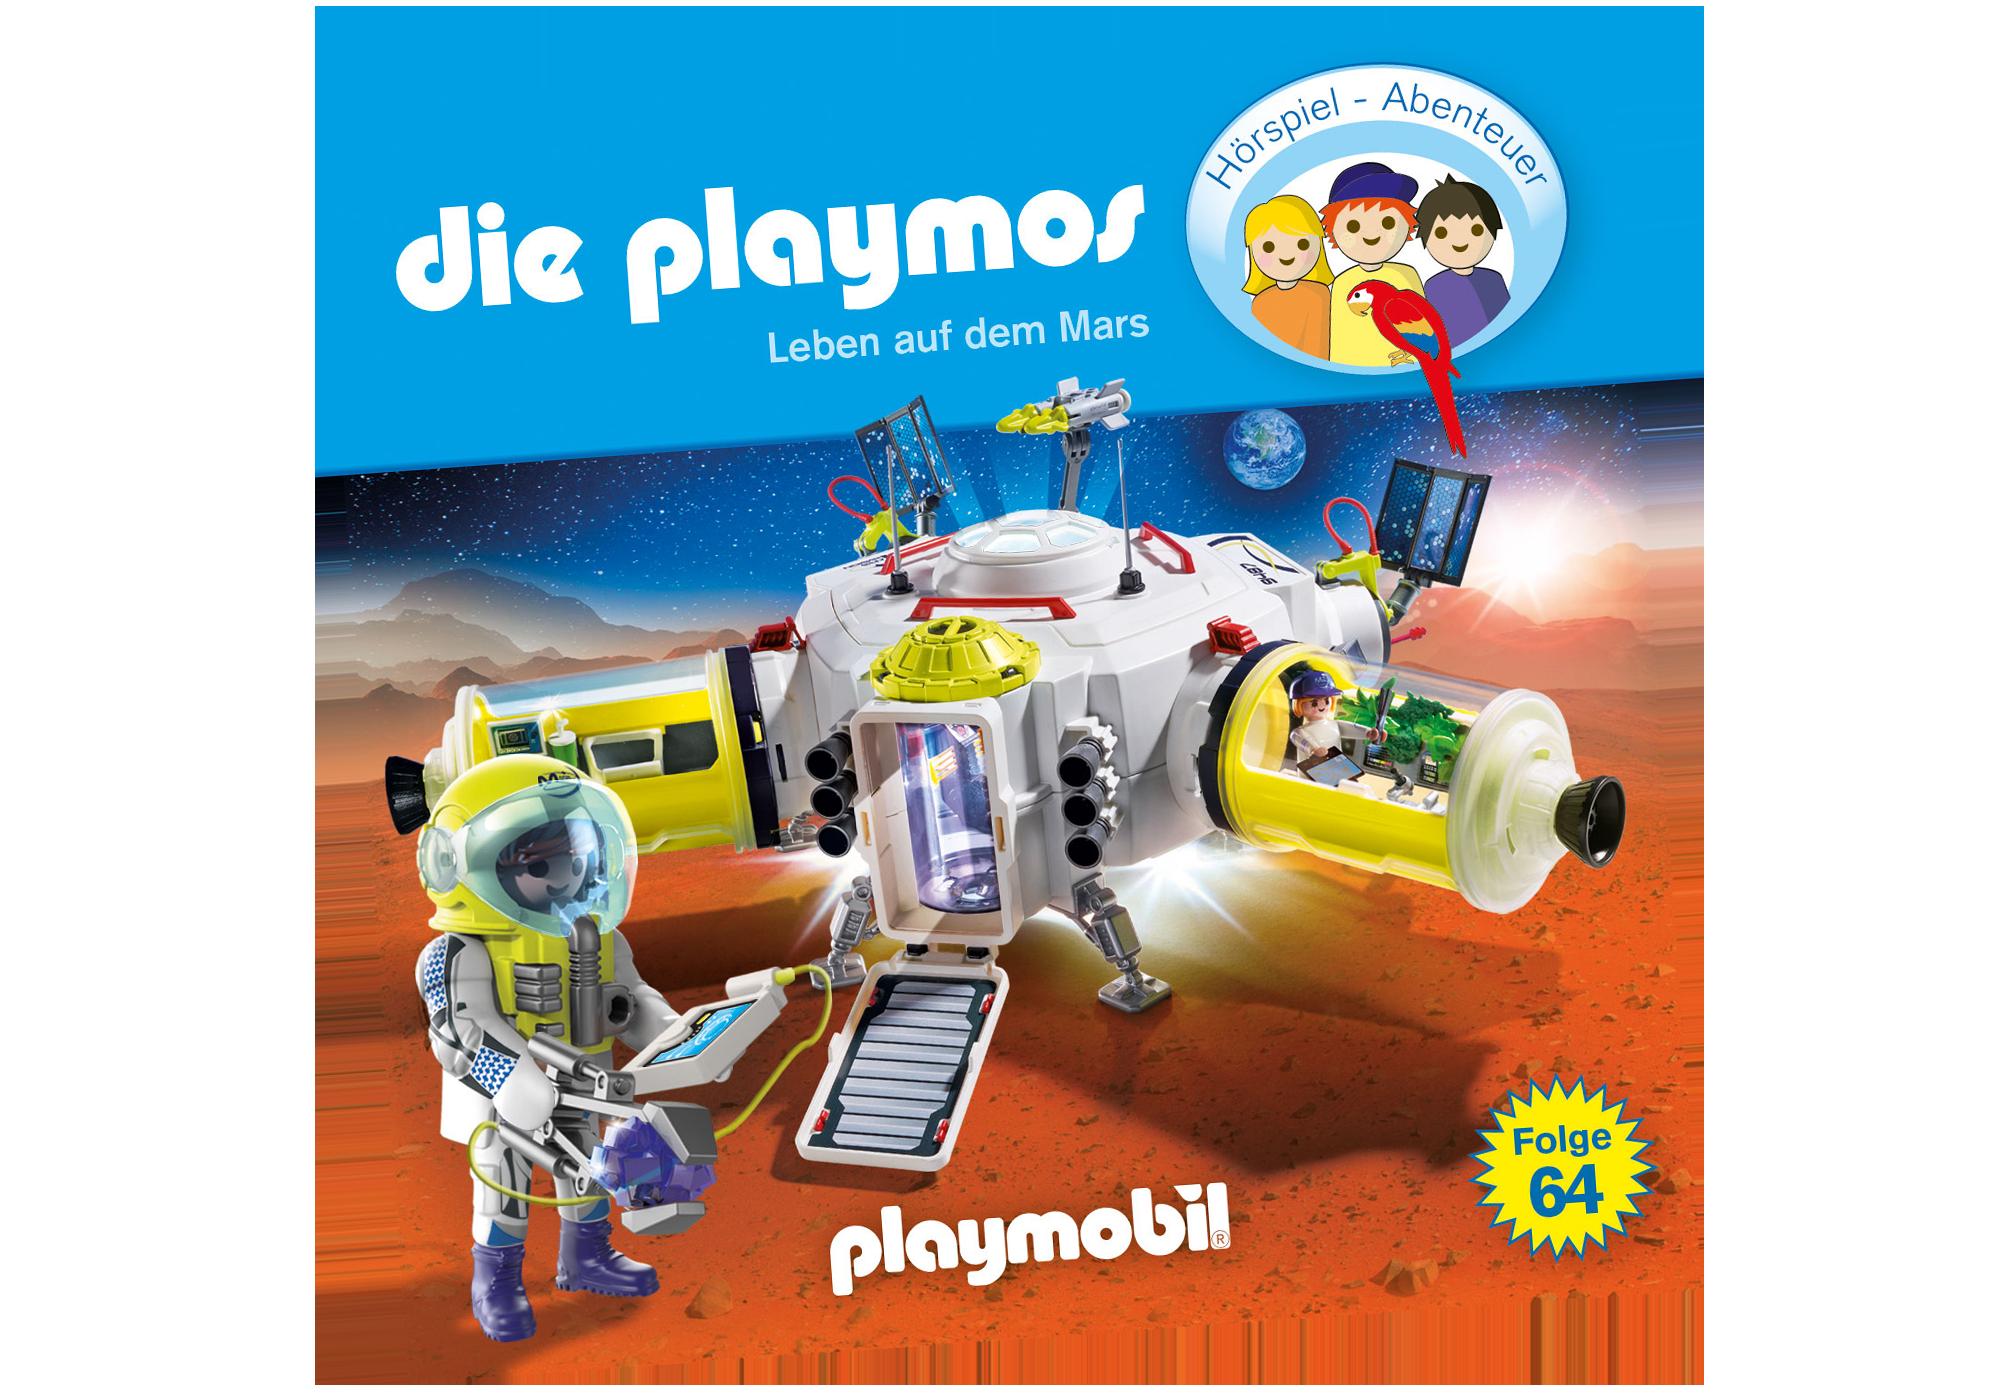 http://media.playmobil.com/i/playmobil/80086_product_detail